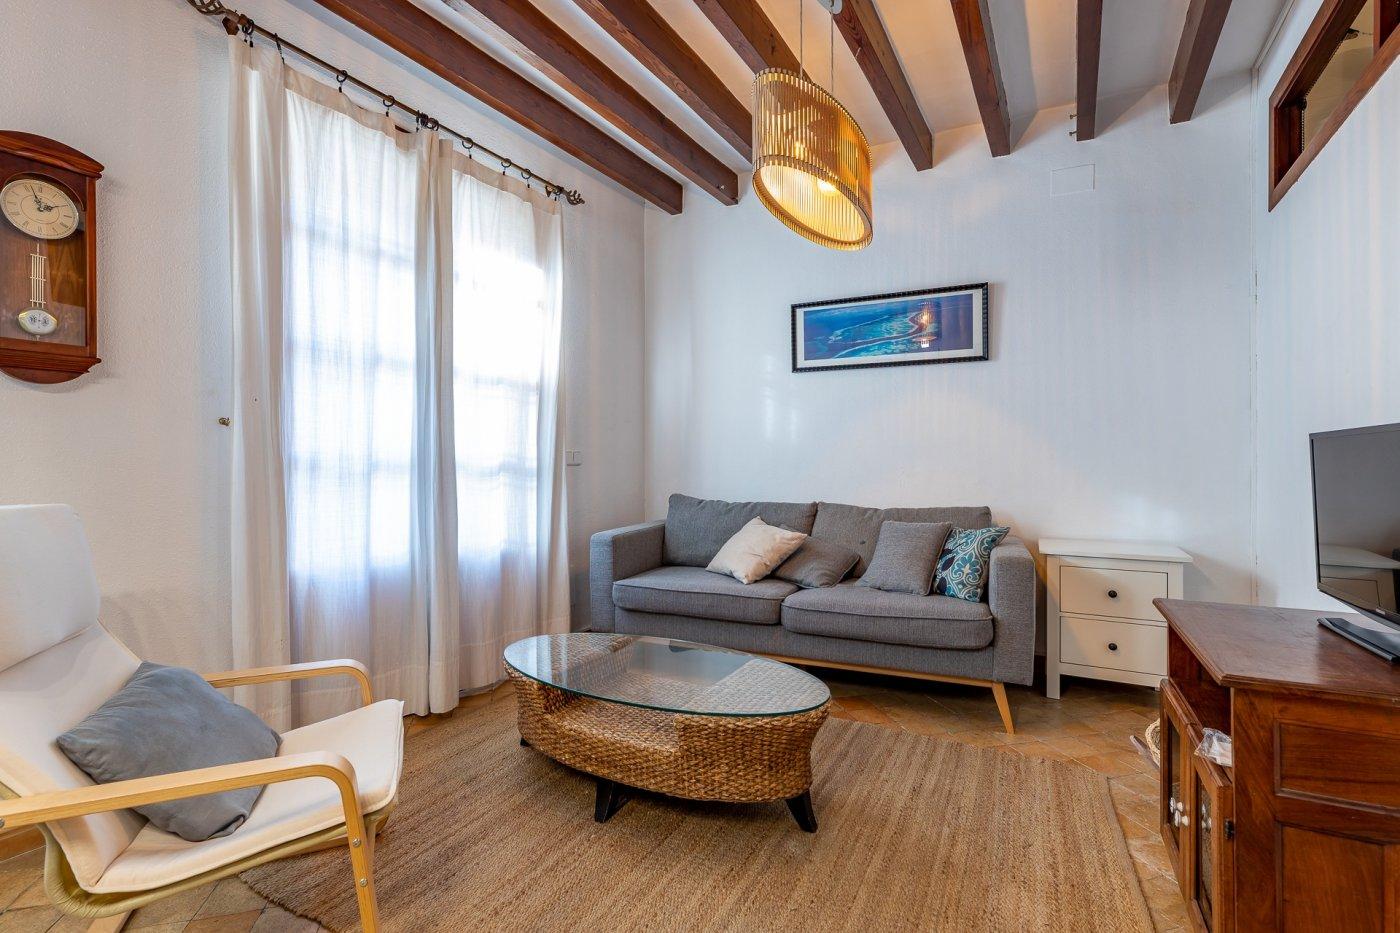 Espectacular apartamento en centro de palma - imagenInmueble8